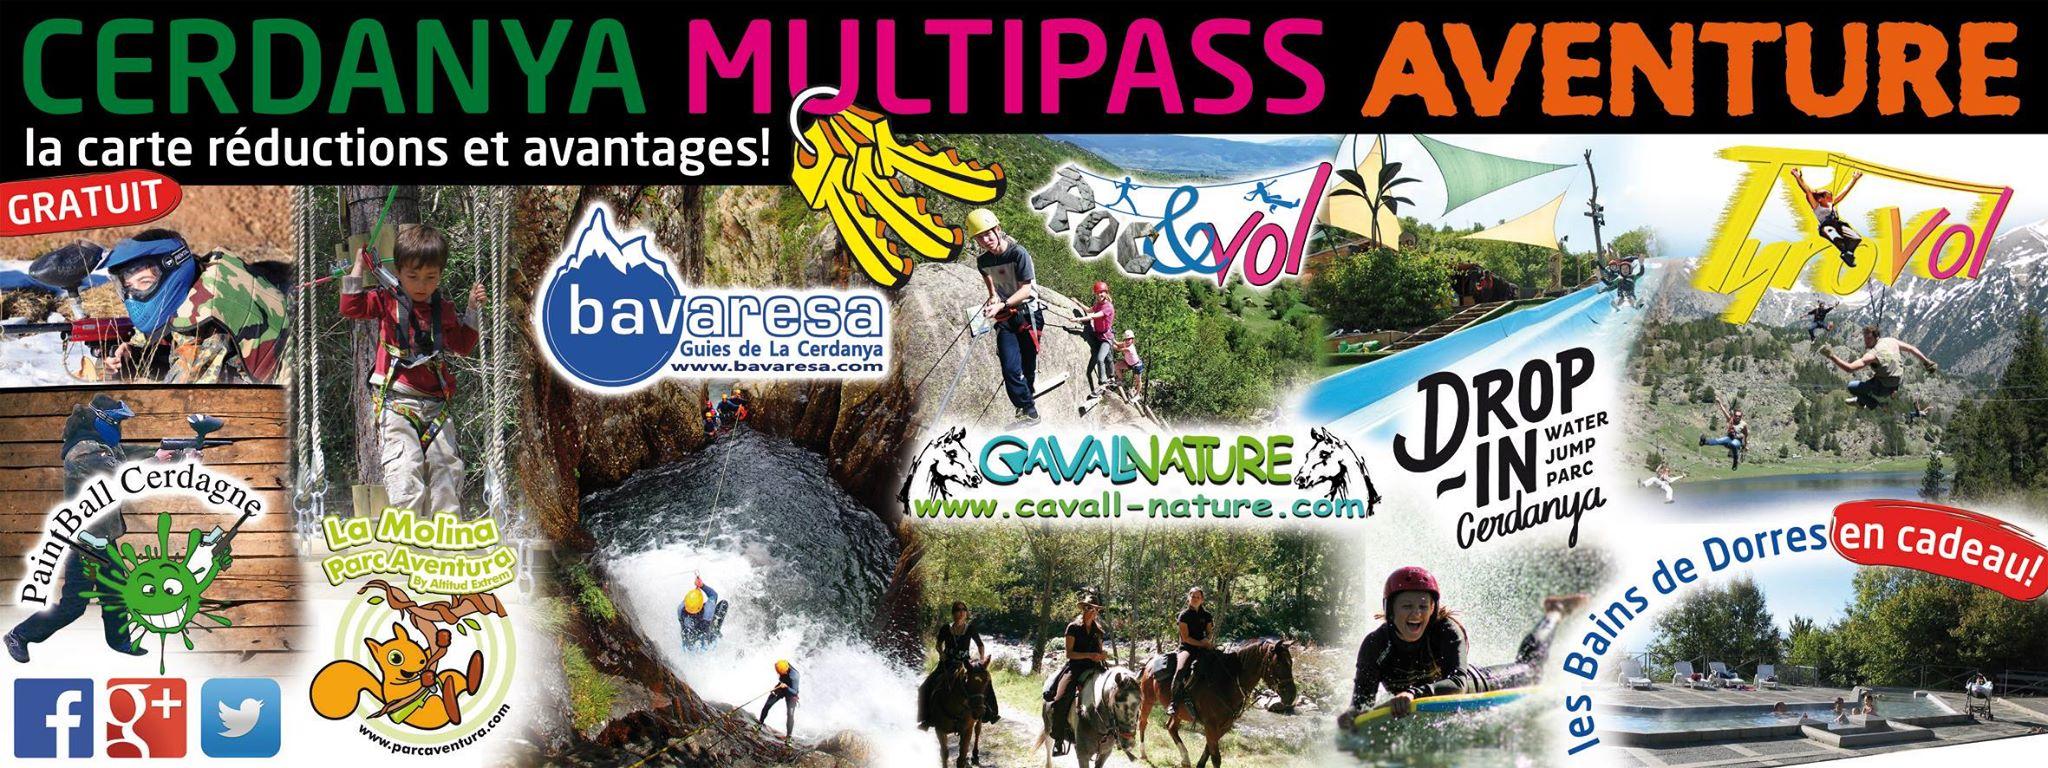 cerdanya-multipass